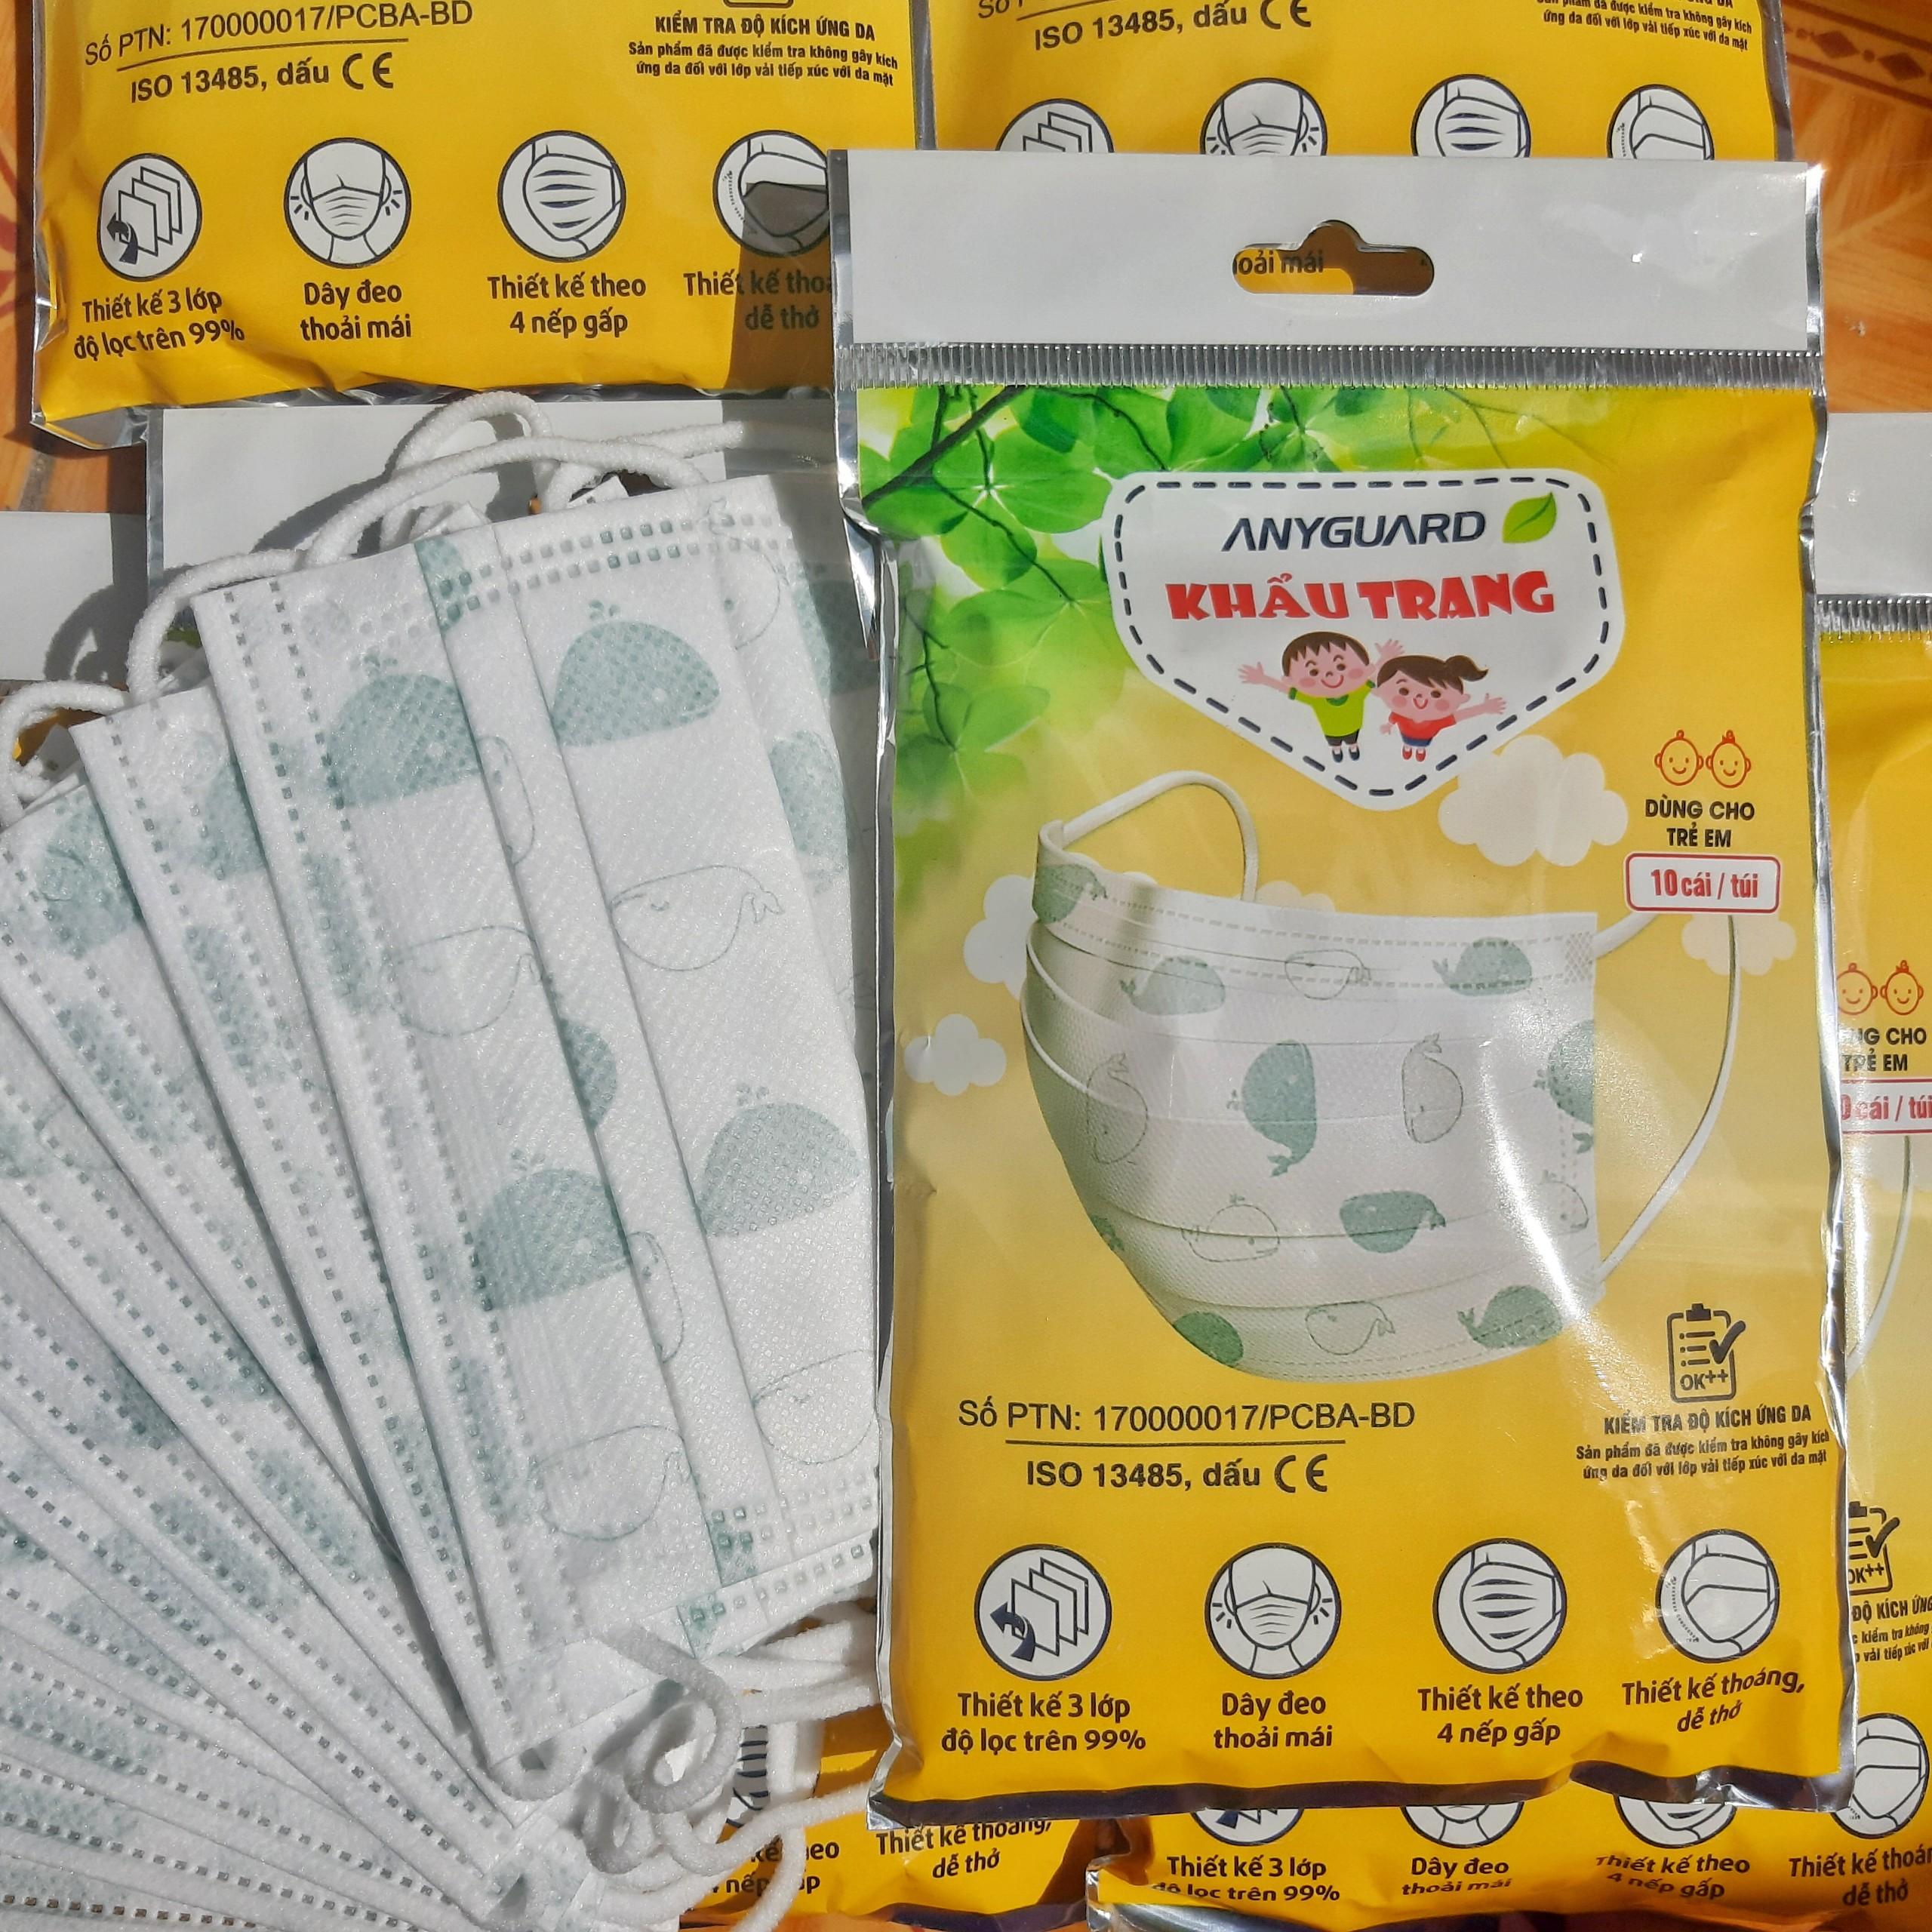 ( 3 tuổi -9 tuổi ) Khẩu trang Anyguard em bé gói 10 cái  - 베이비 마스크- Face mask for kids